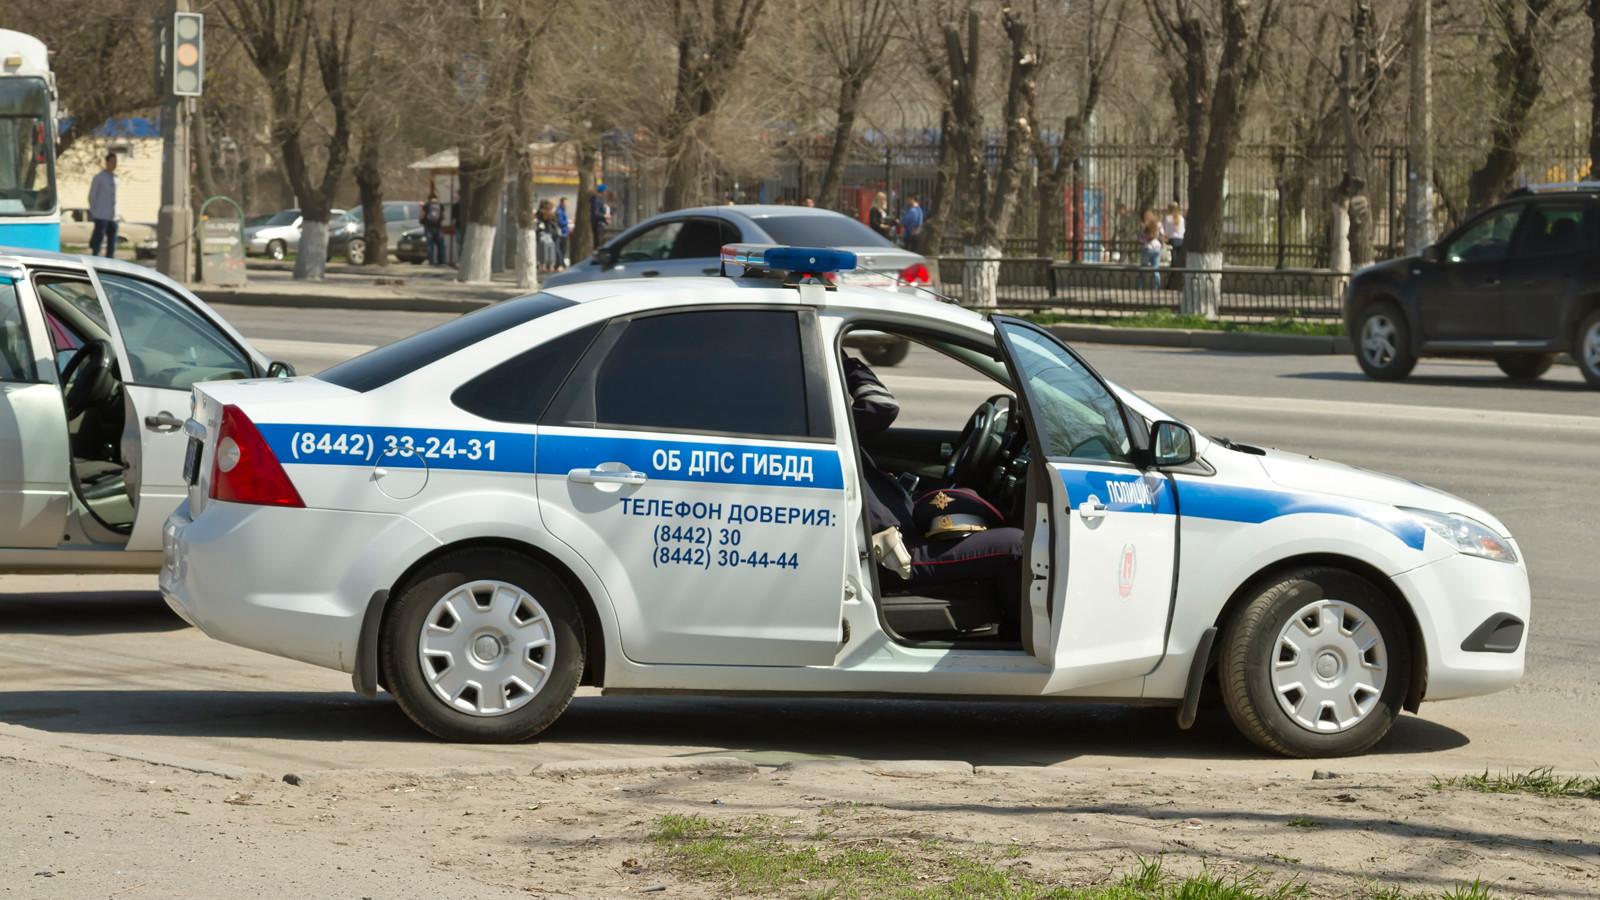 Водителям запретят снимать накамеру служащих  ГИБДД